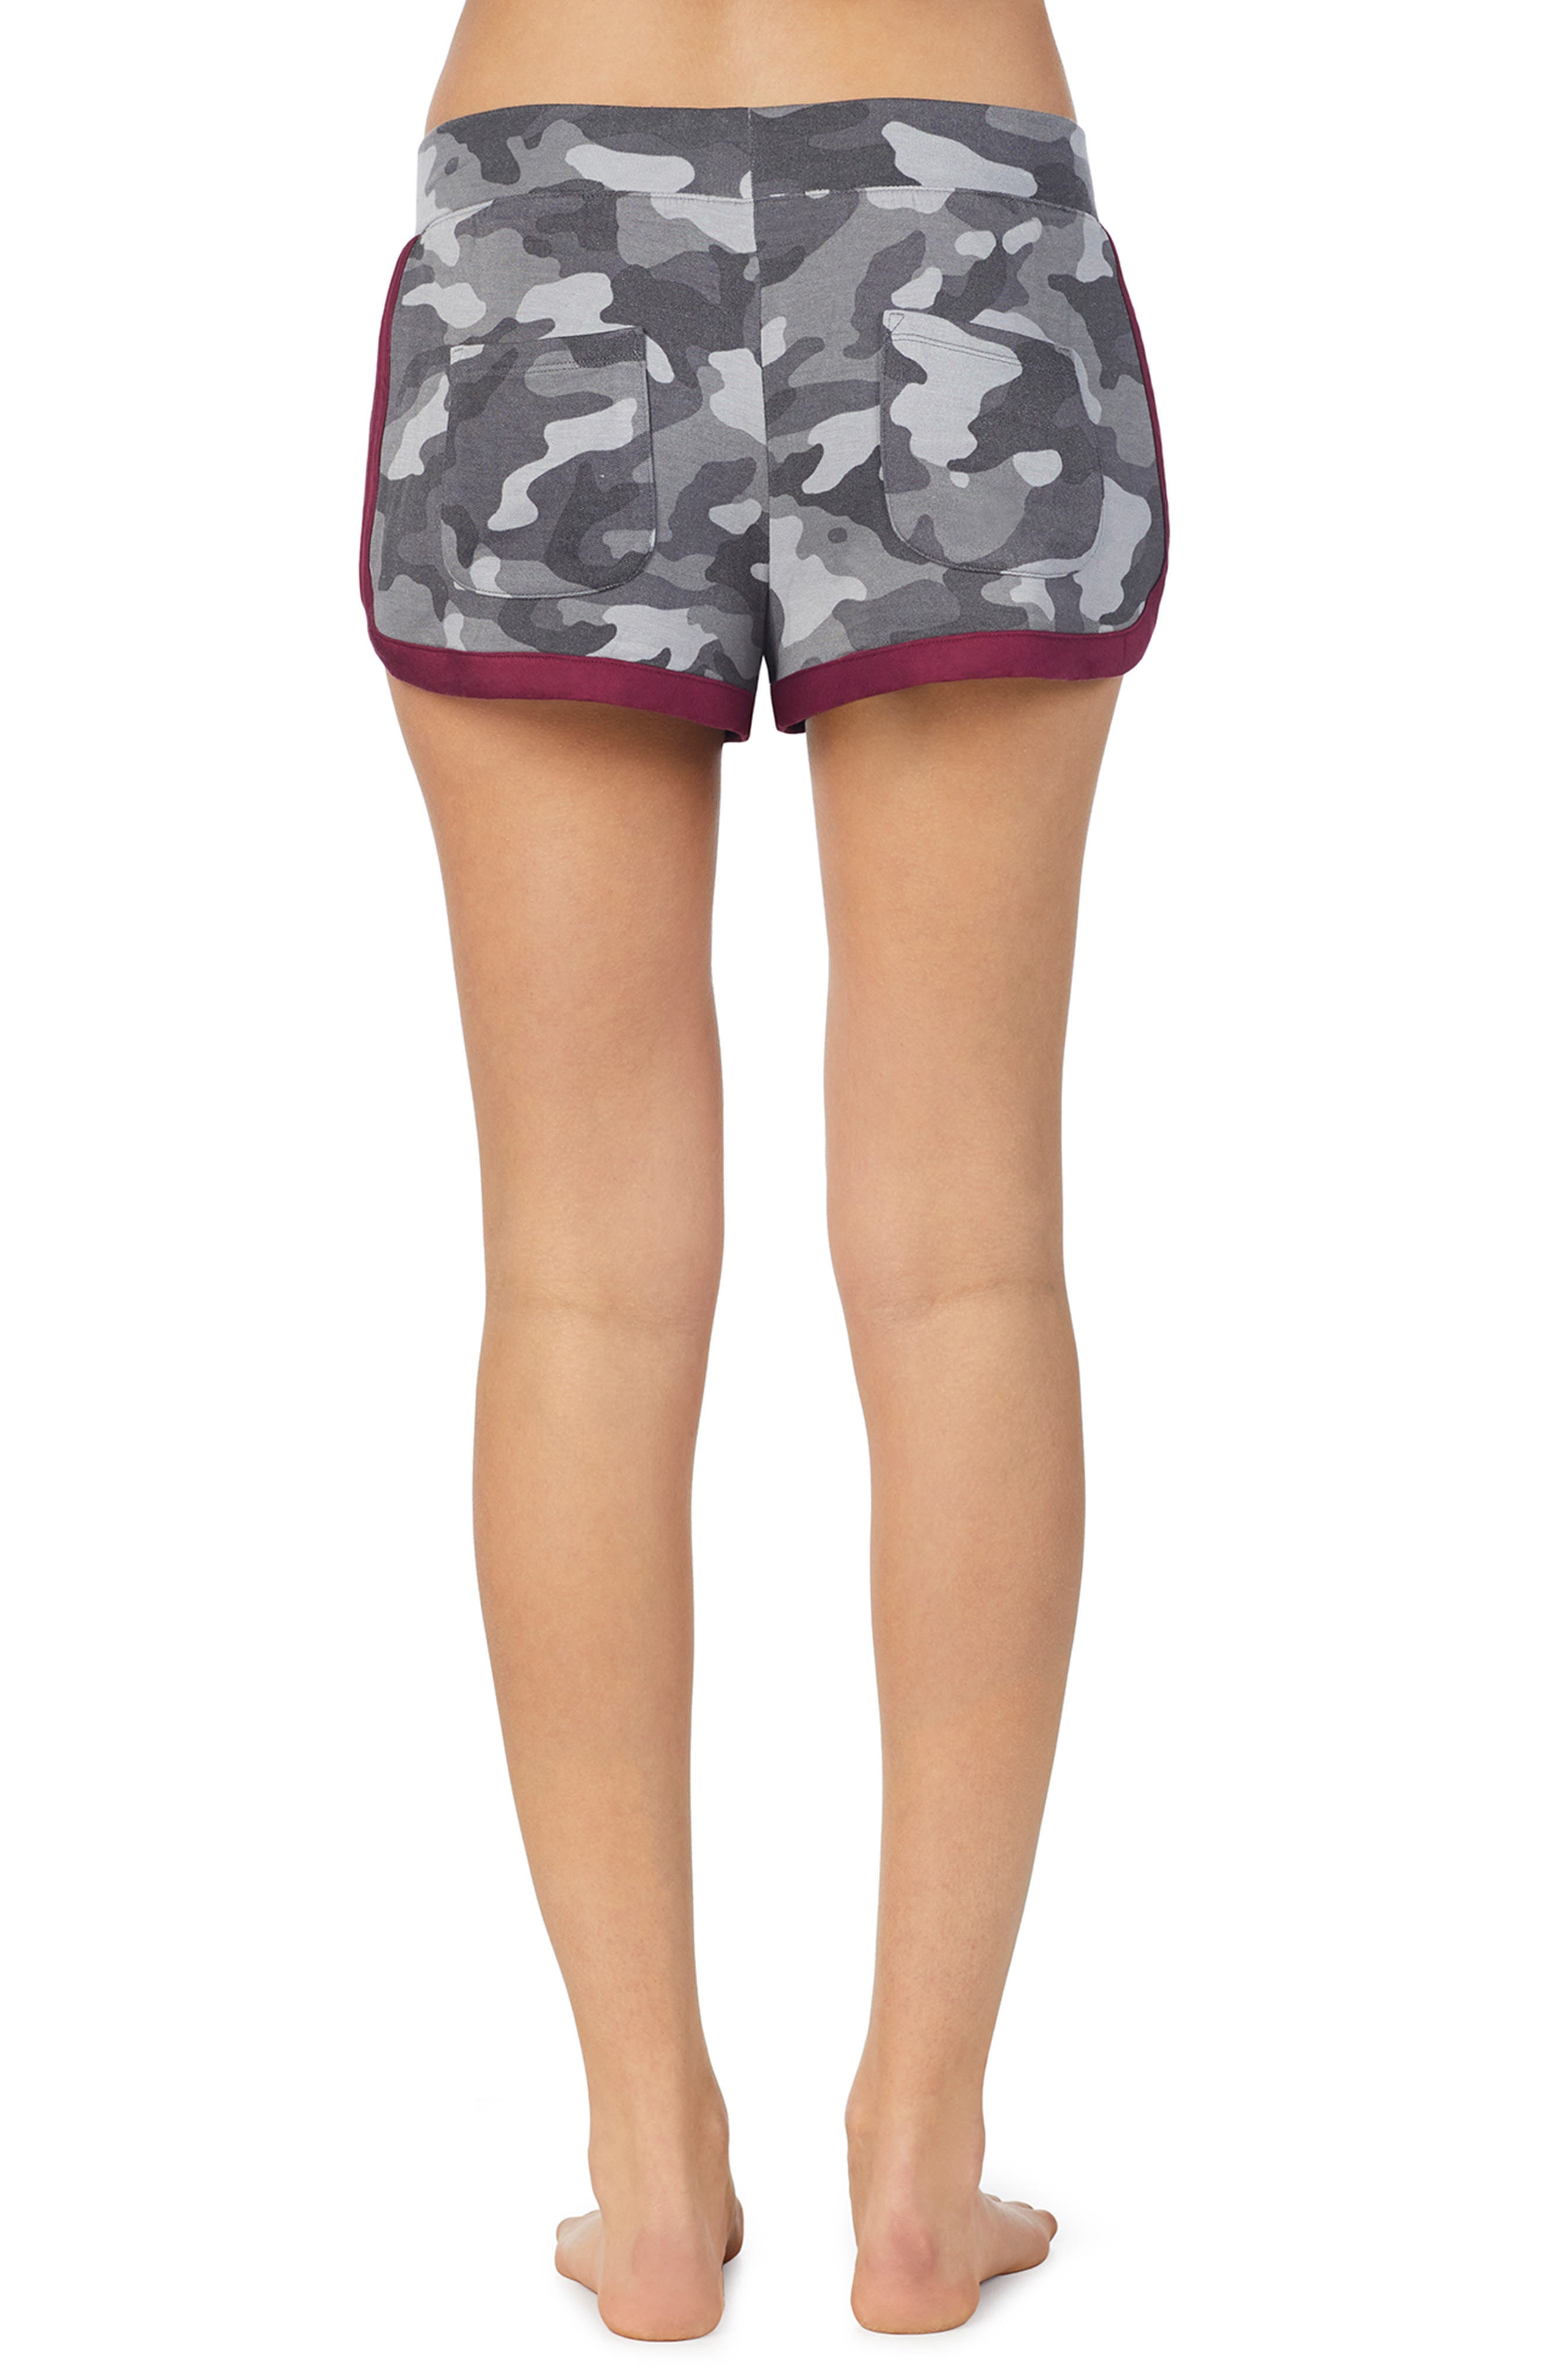 Lounge Shorts,                             Alternate thumbnail 2, color,                             Grey Prt